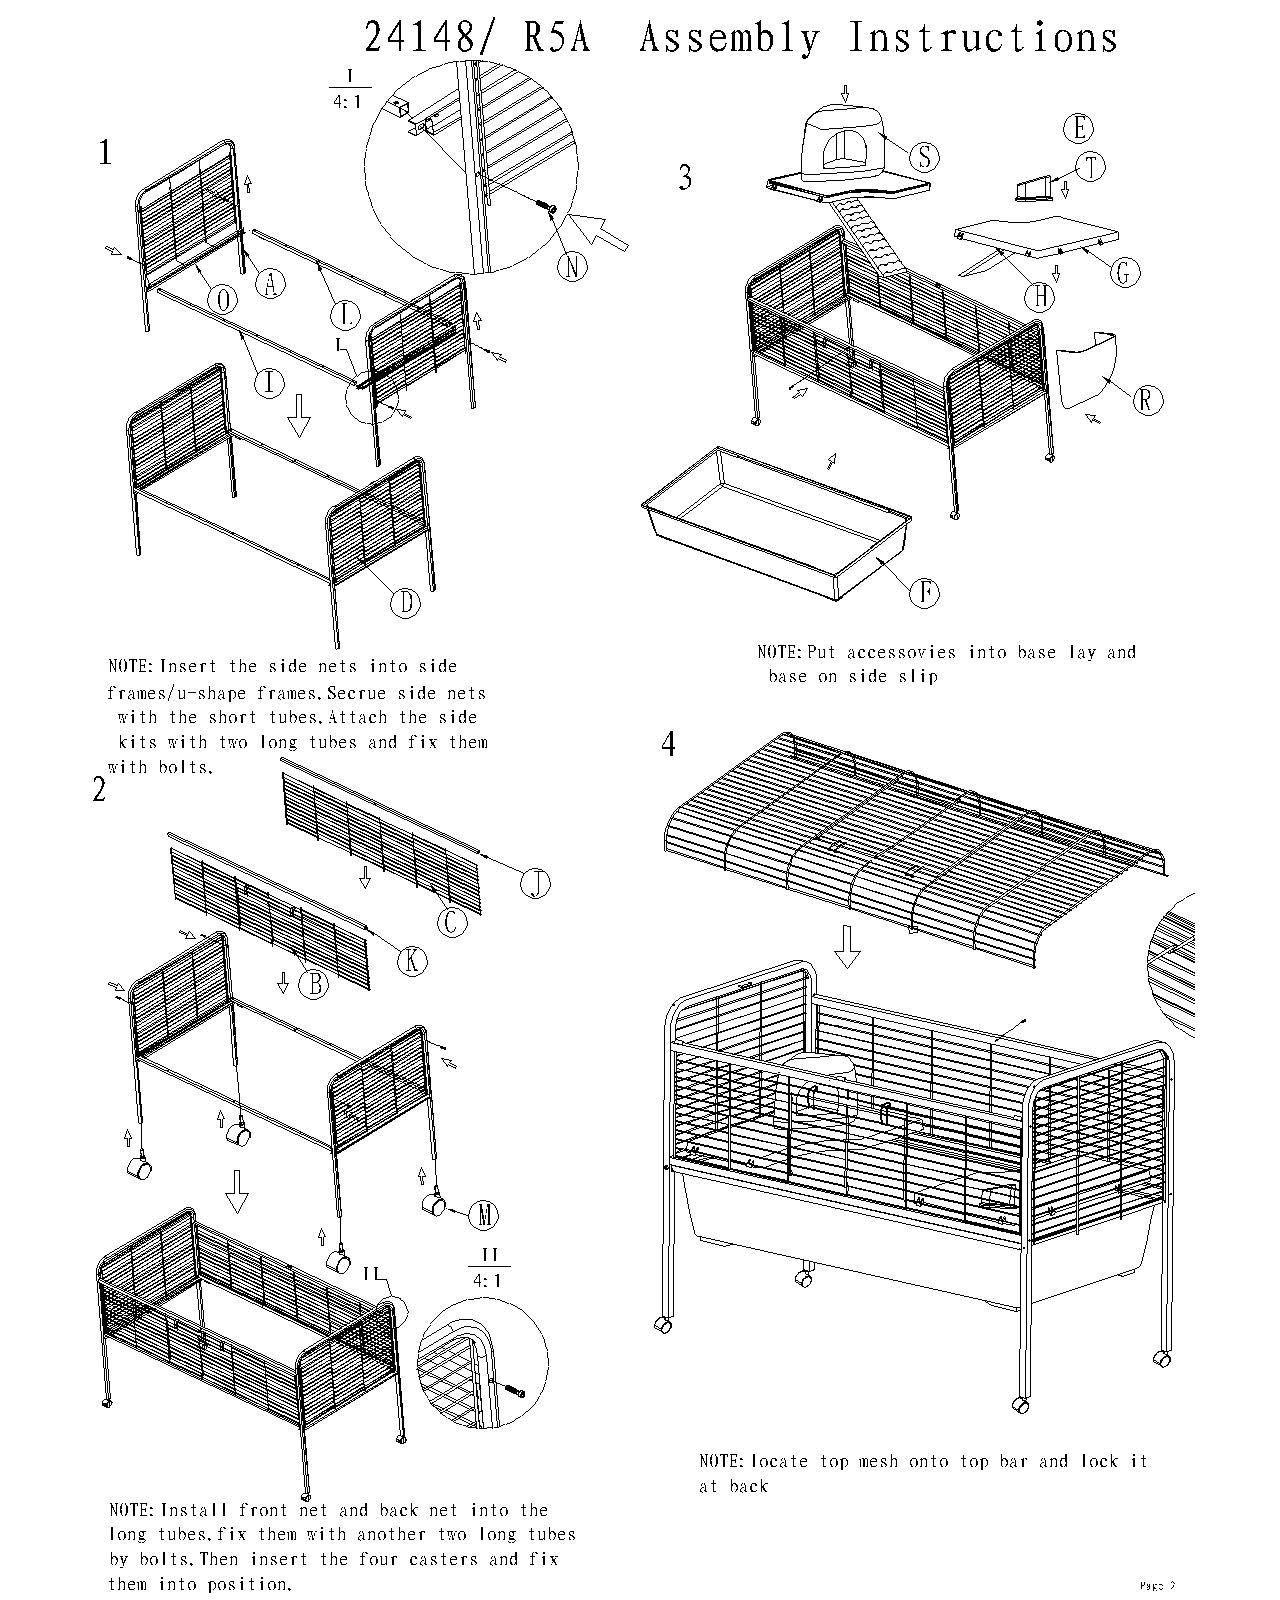 Tomtom Xxl Manual